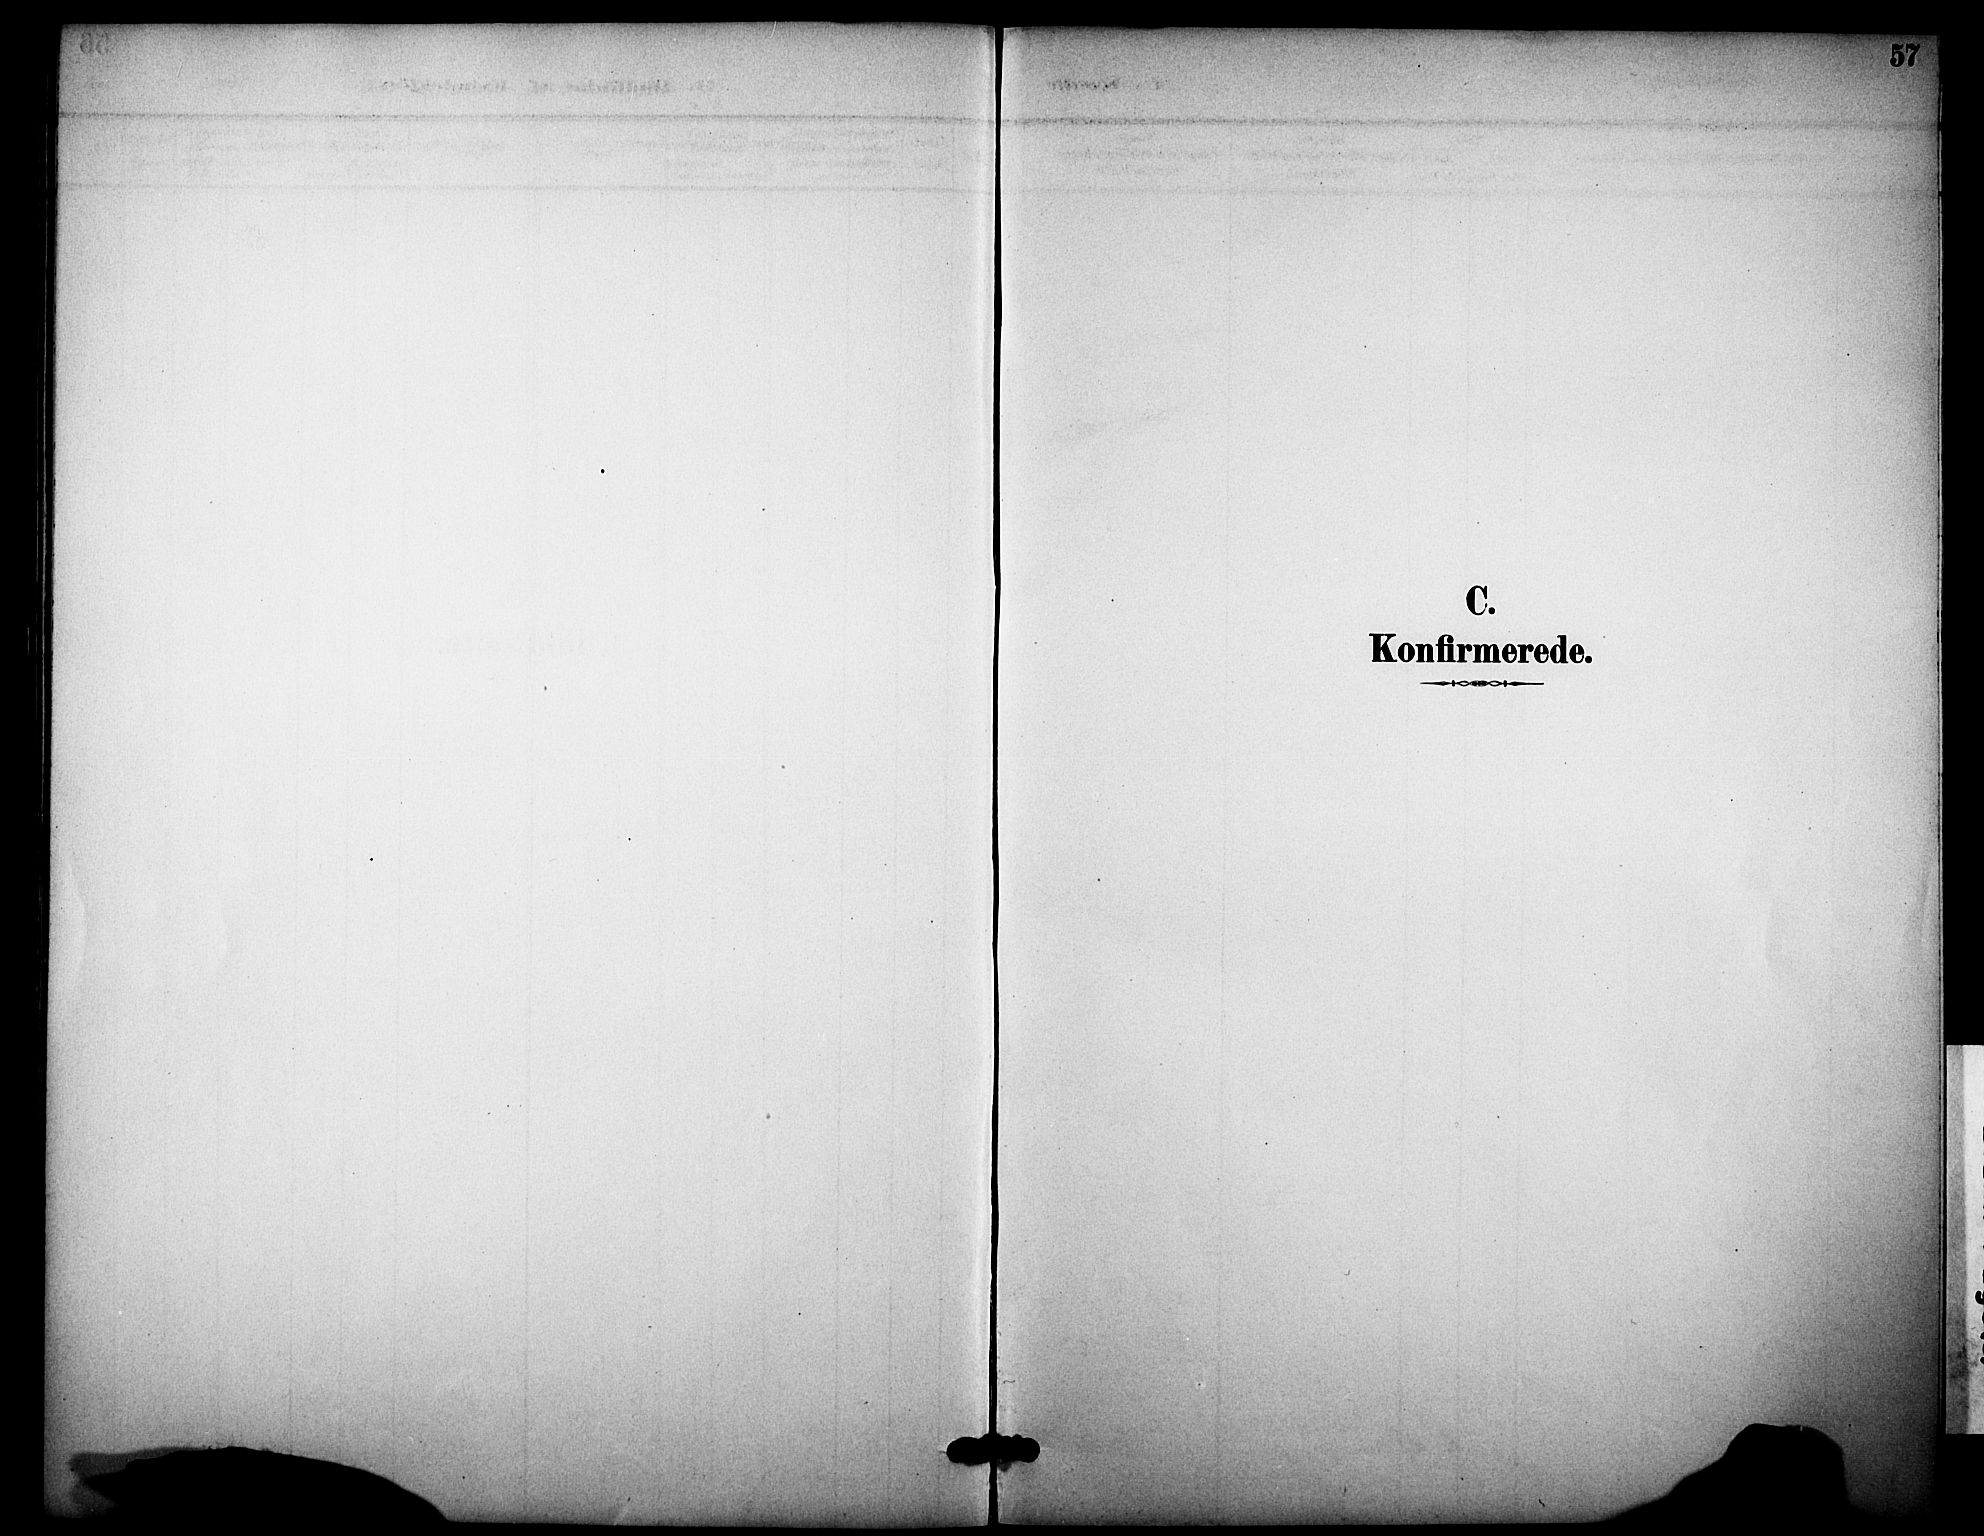 SAKO, Heddal kirkebøker, F/Fb/L0001: Ministerialbok nr. II 1, 1884-1910, s. 57